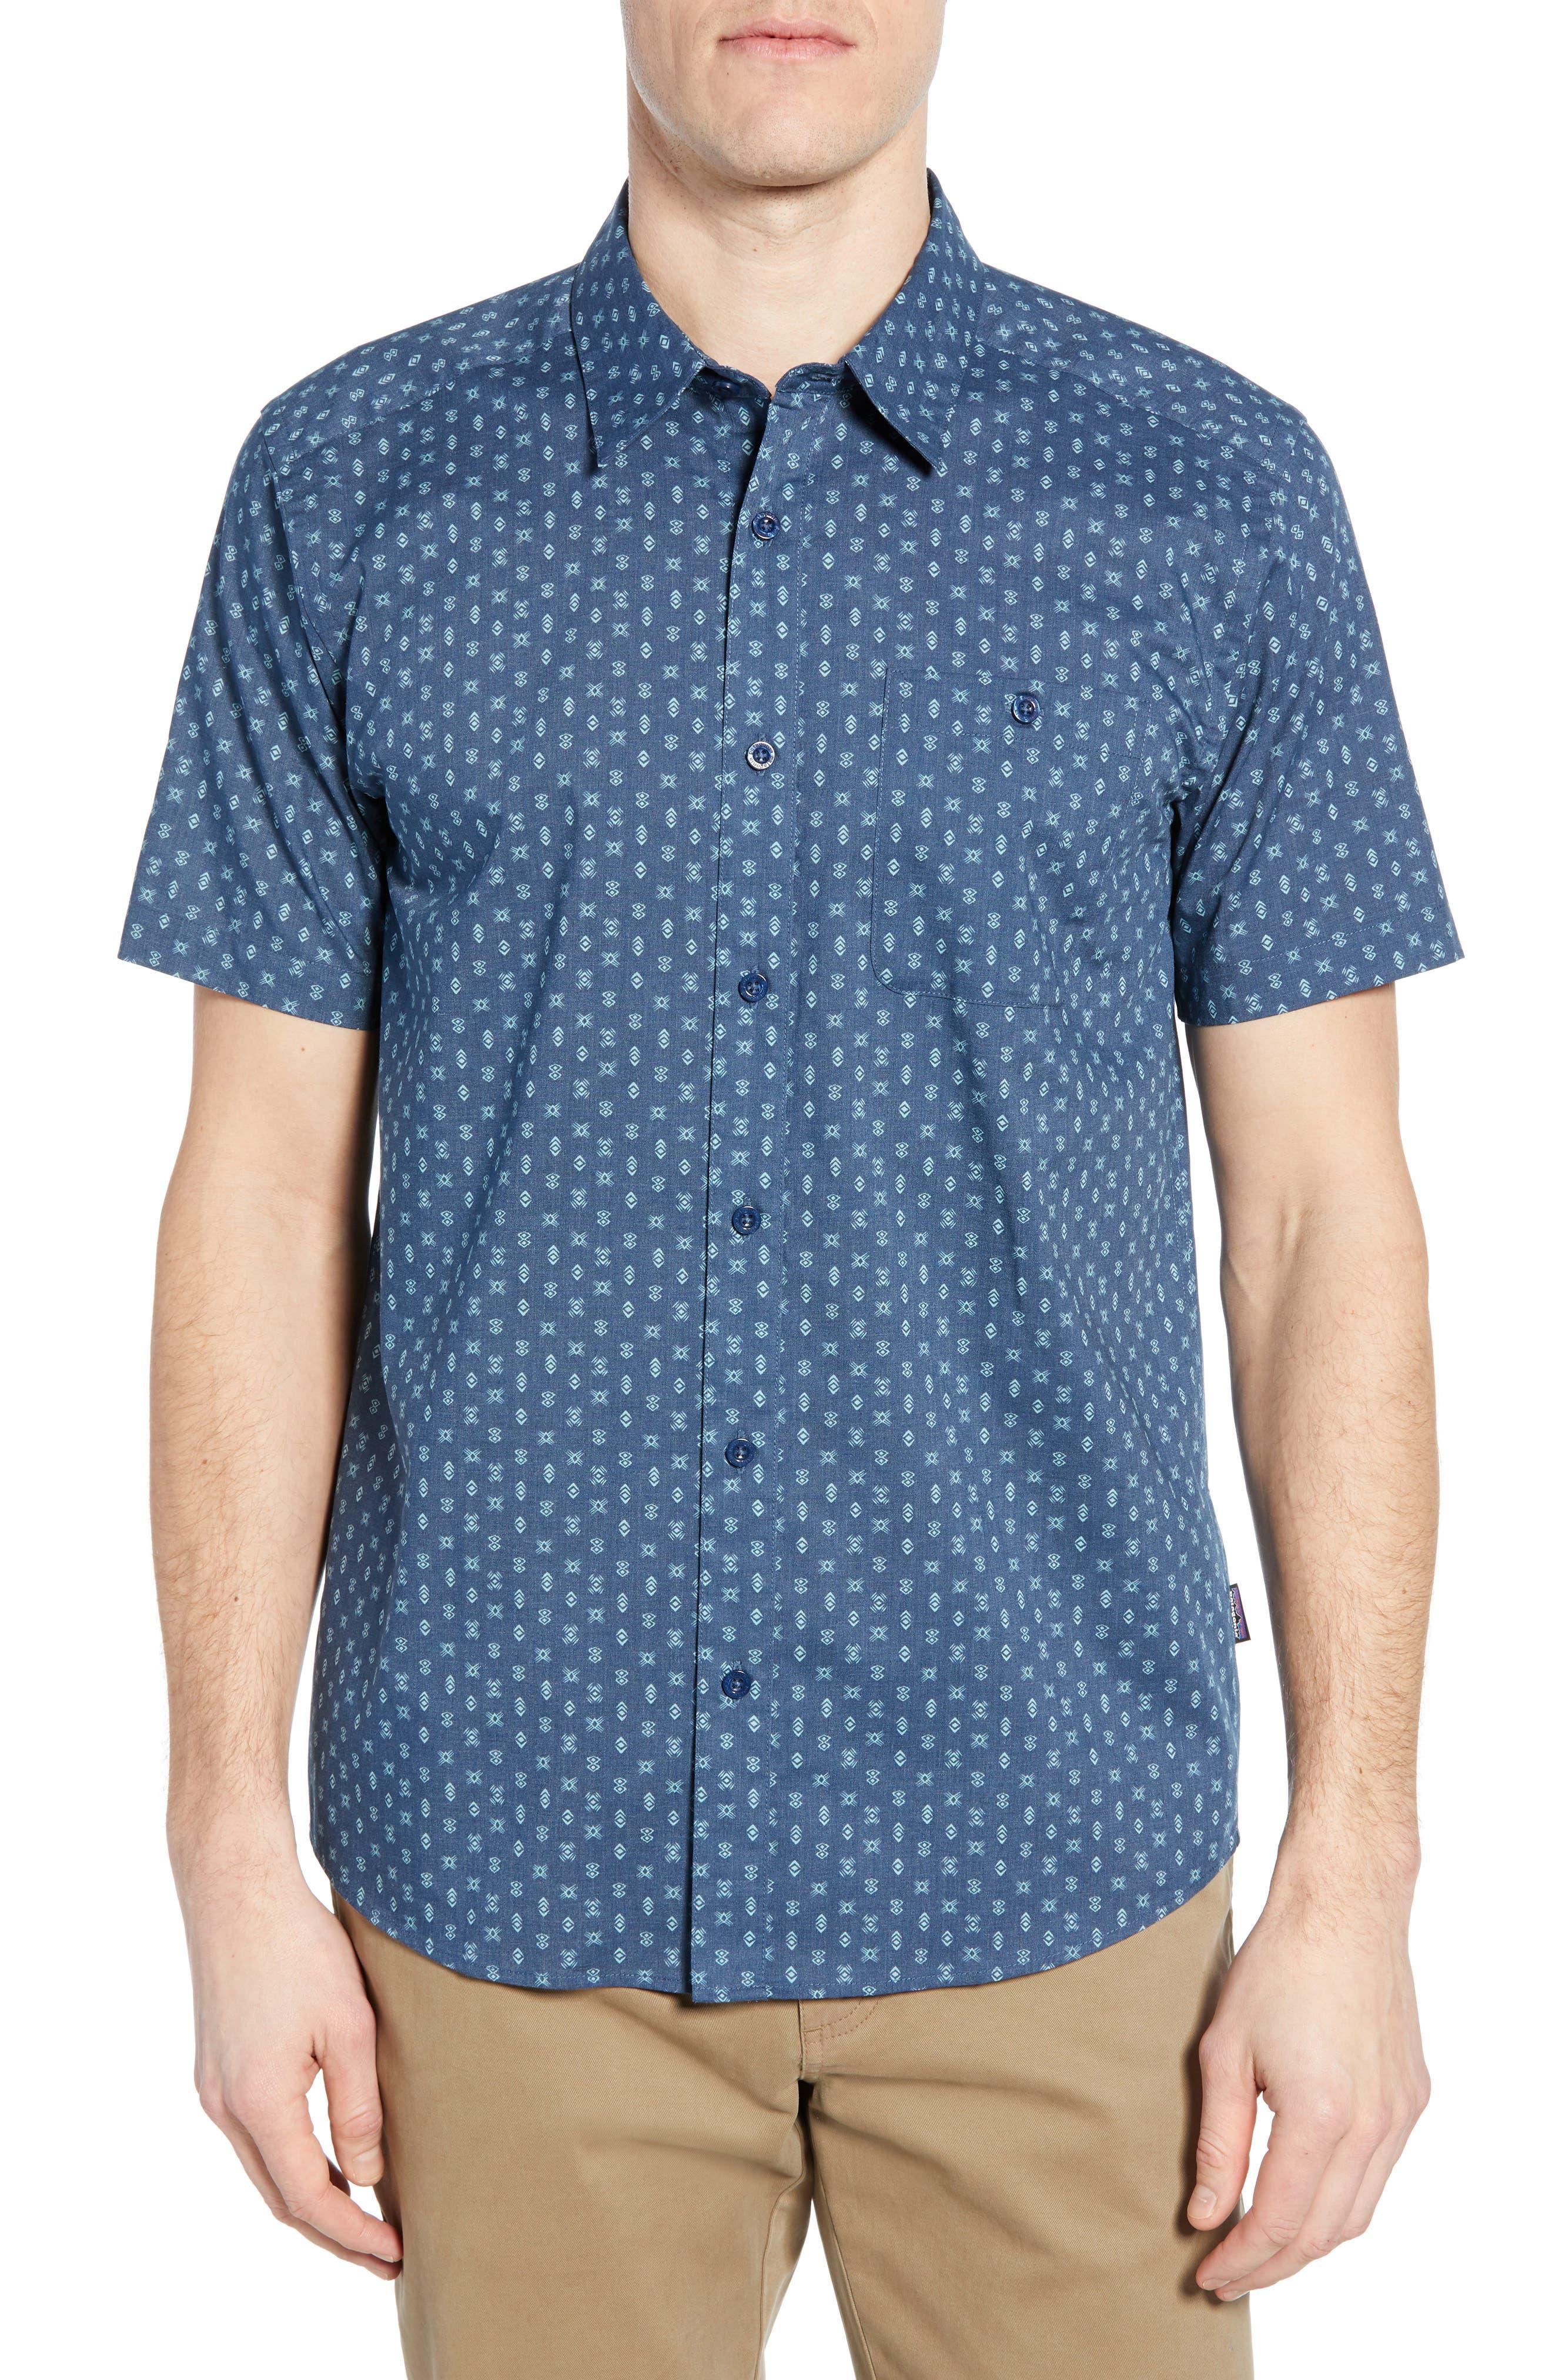 Patagonia Go To Regular Fit Short Sleeve Sport Shirt, Blue